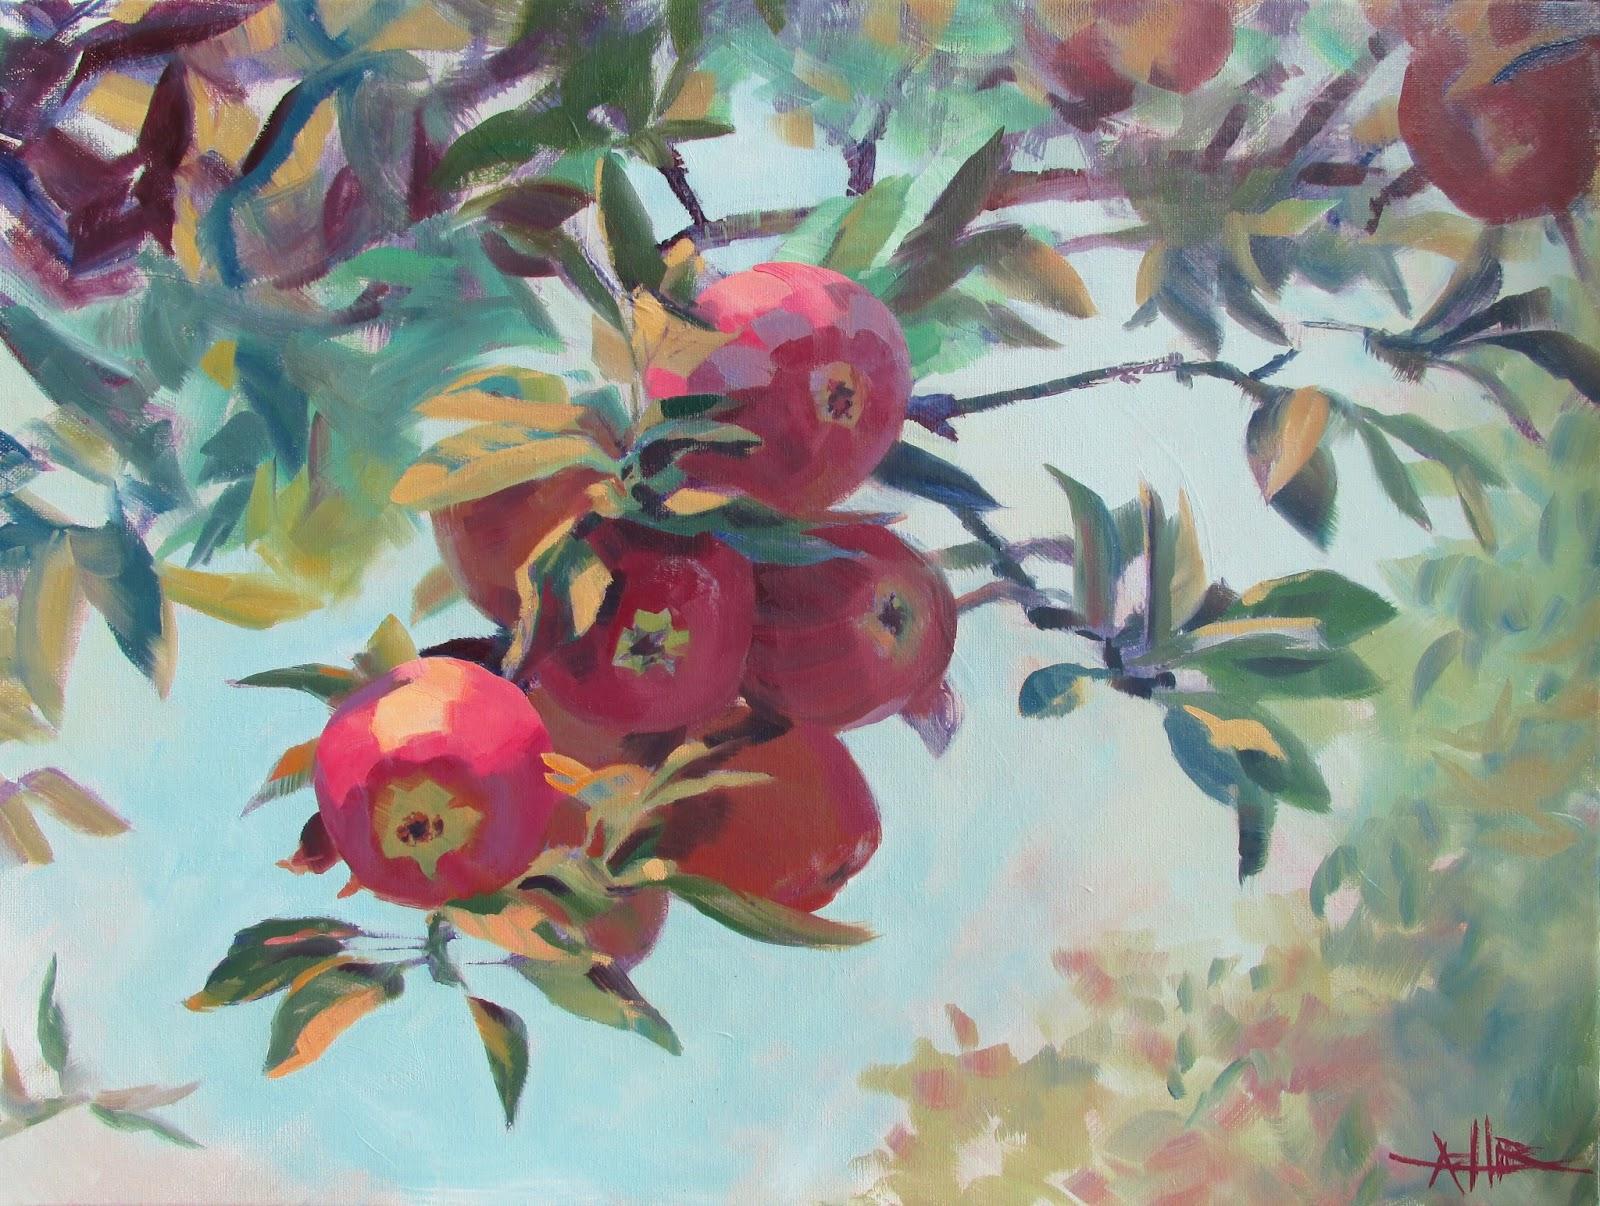 Artistaddie 2015 apples on the tree copyright hirschten 2015 oil on canvas 18 x 24 prints available on fine art america m4hsunfo